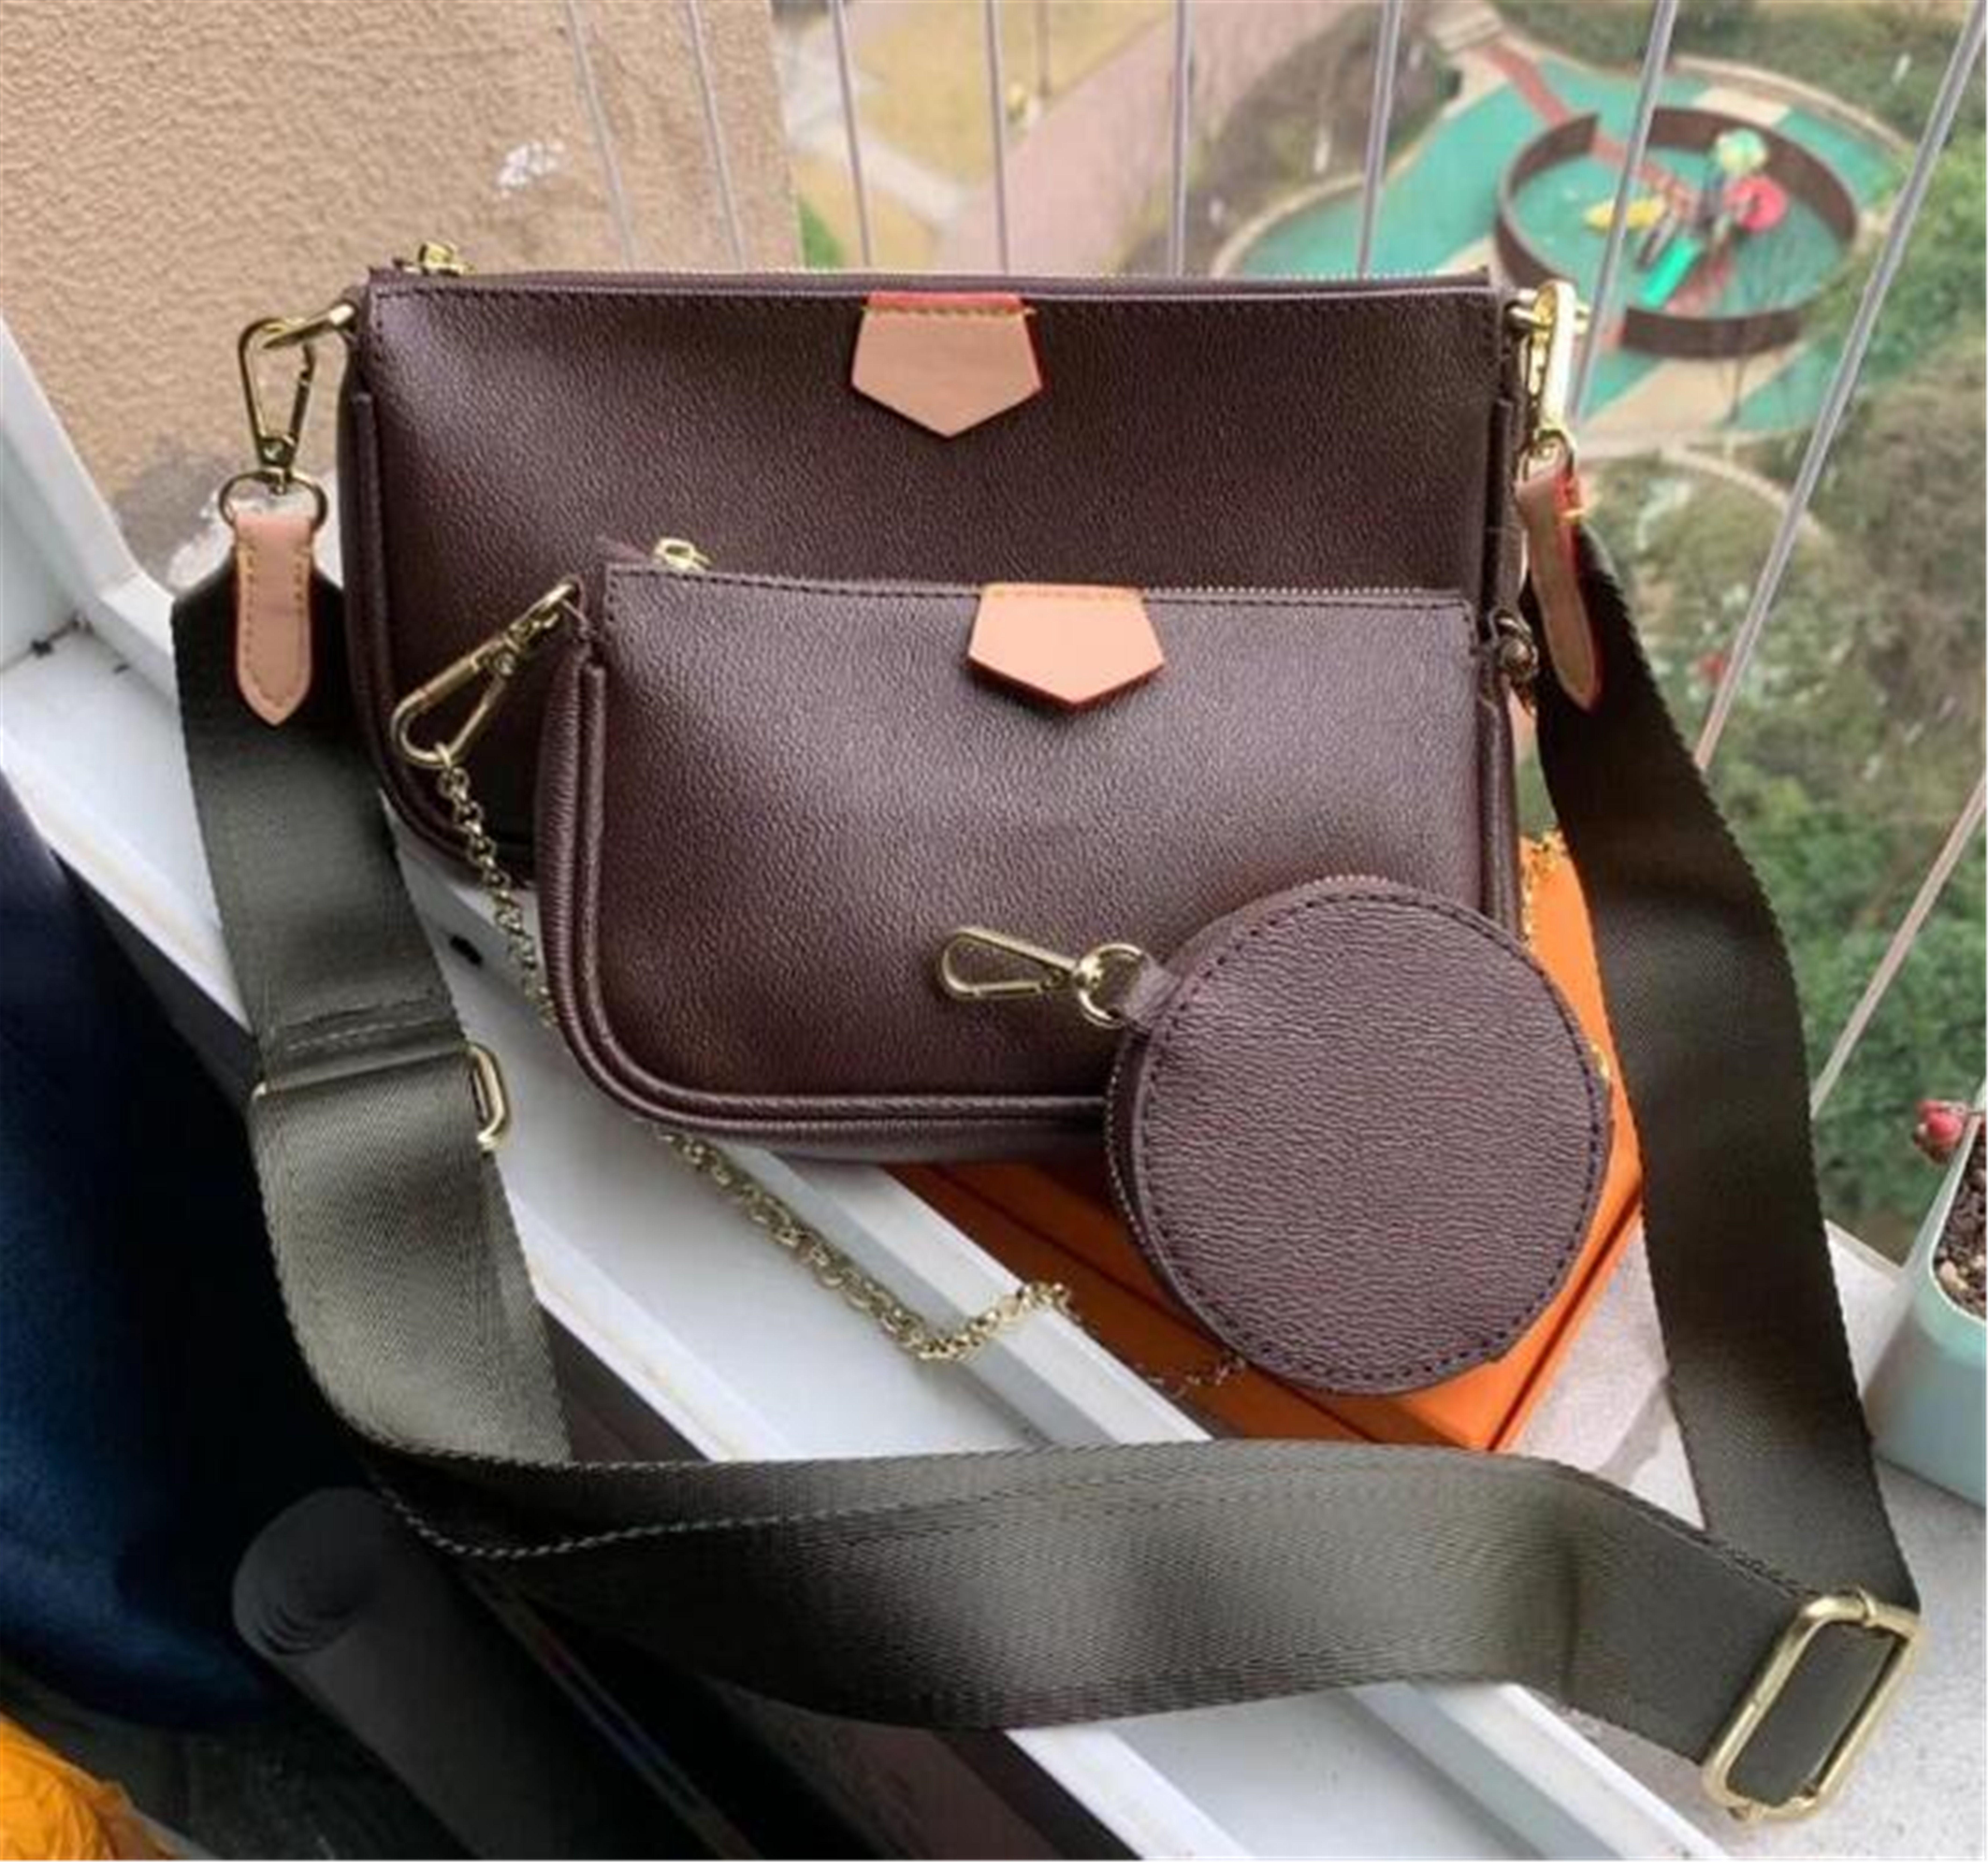 VHHDBAGG LHANDBAG TELEFONO HOT HOT BAGS Borsa moda borsa a tre pezzi Portafoglio GRATUITO FREE Shopping DOR combinazione borse spalla xdrmk